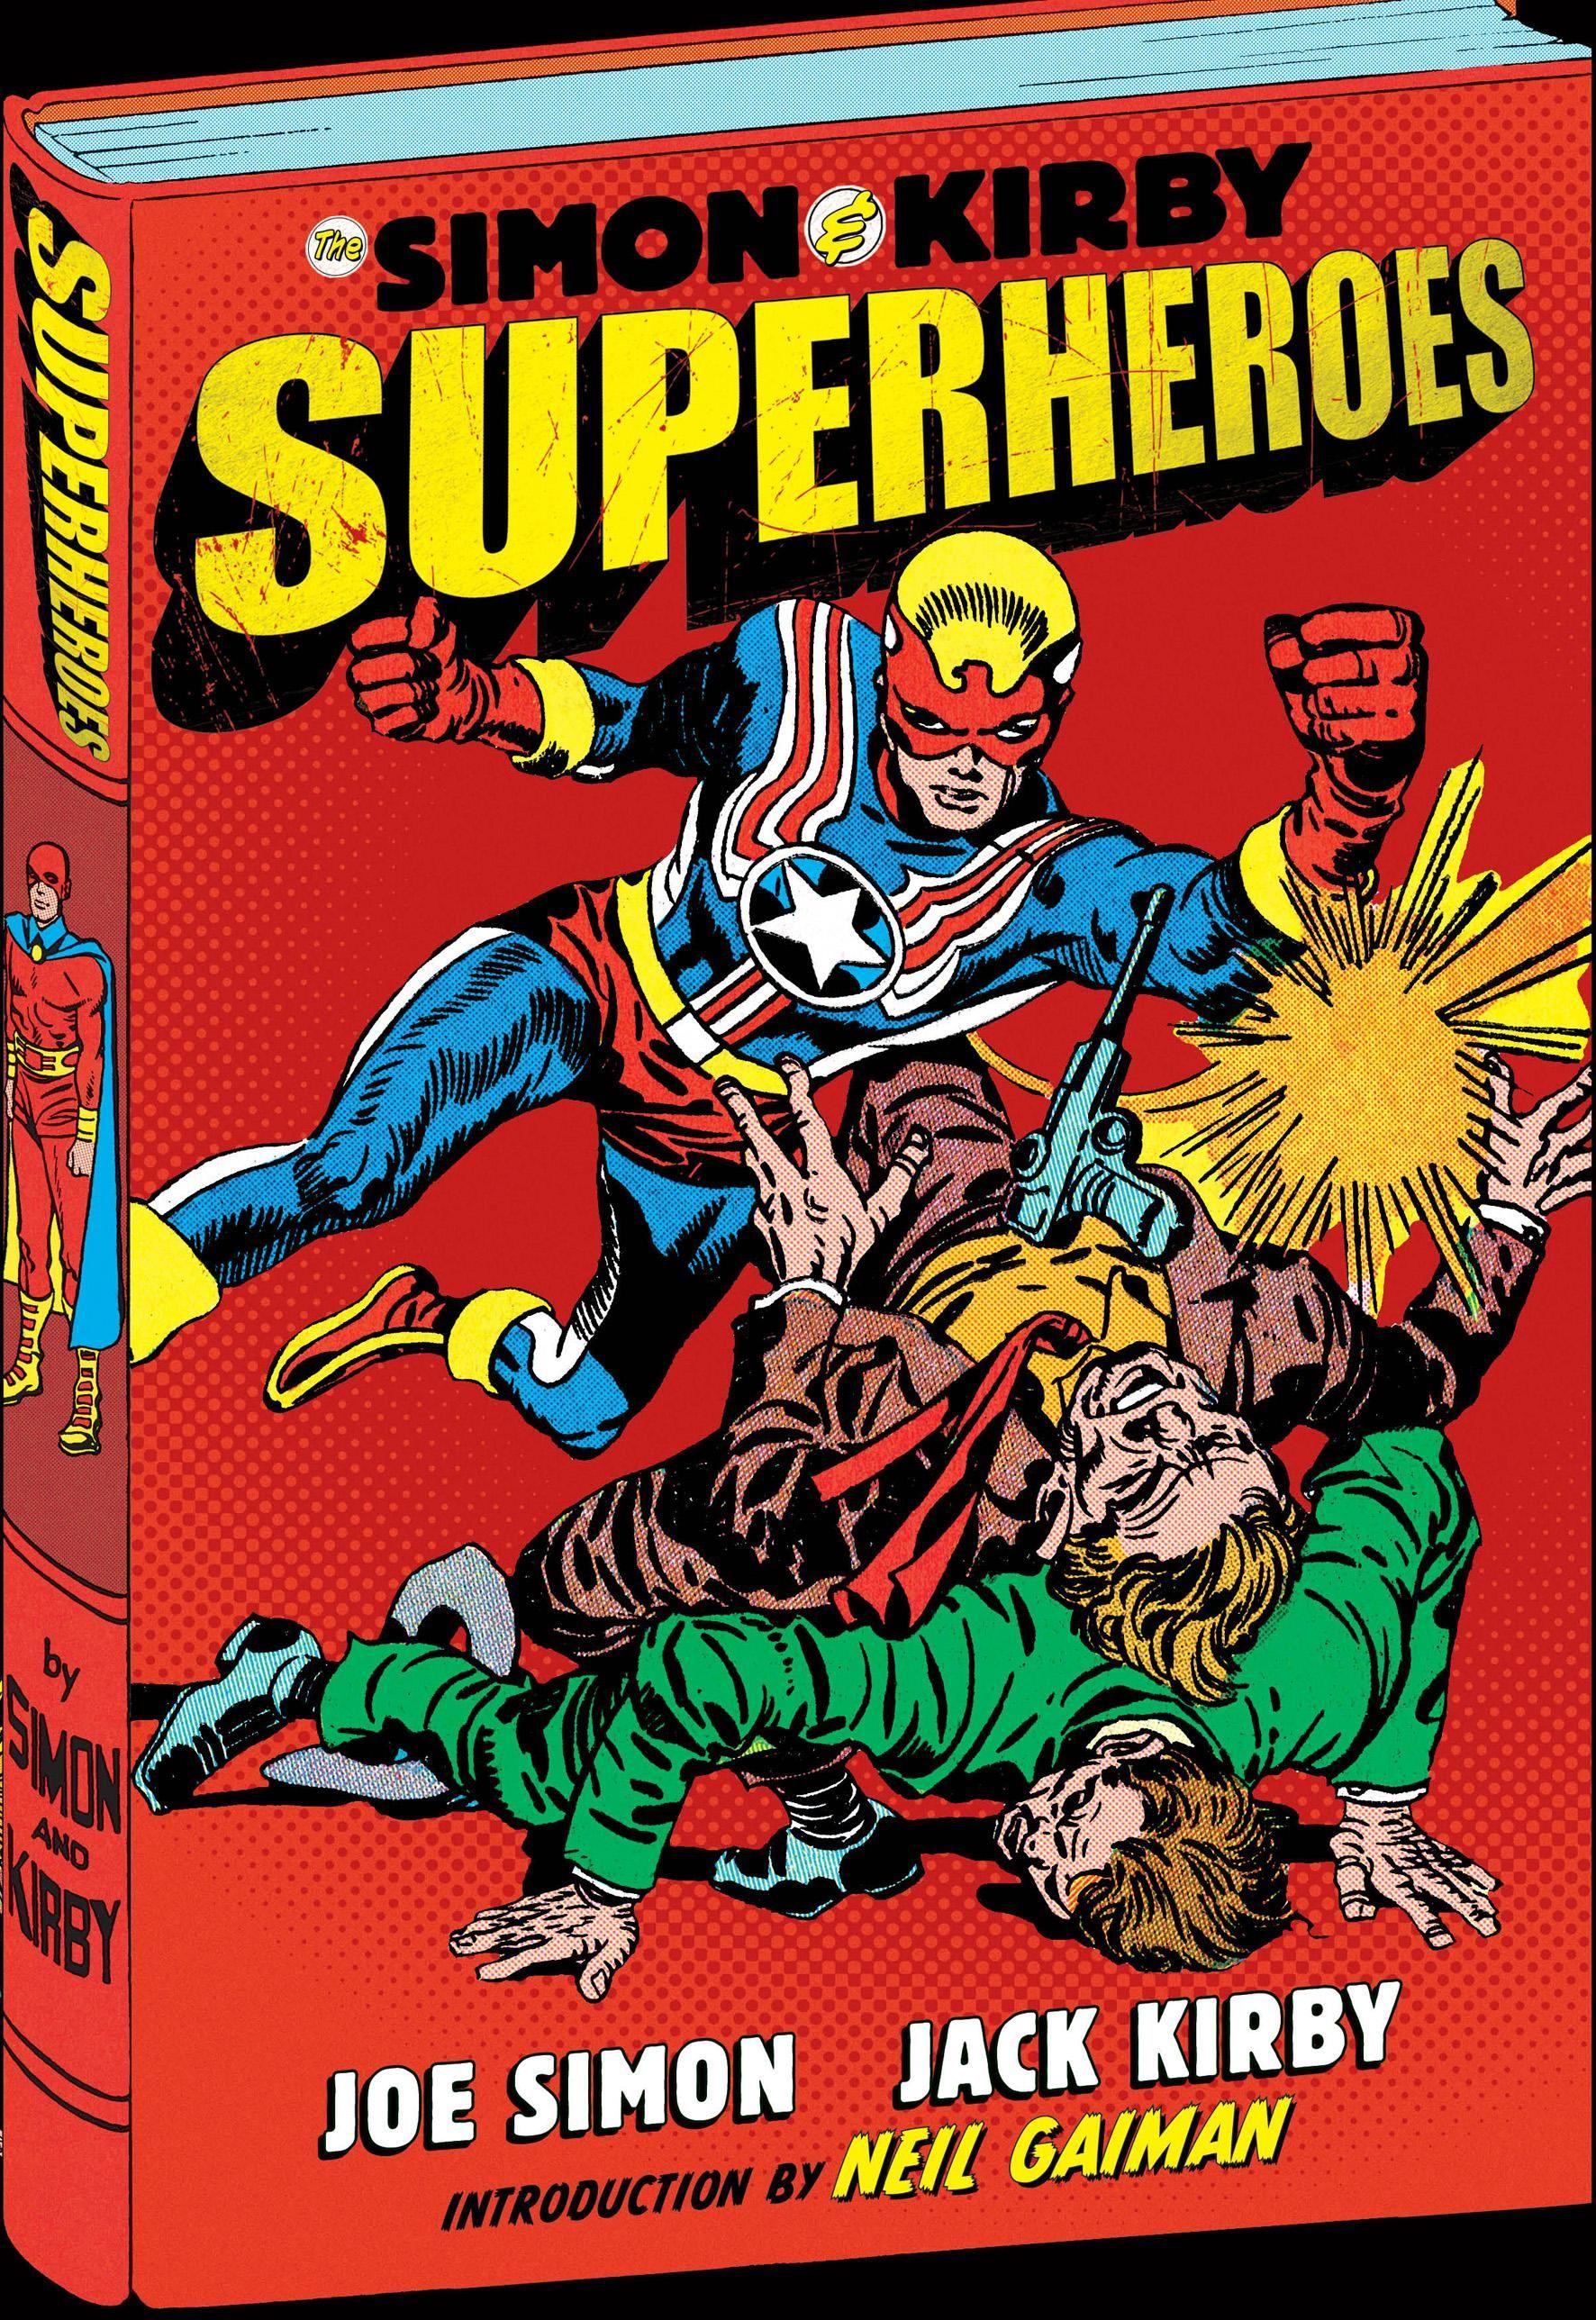 The Simon Kirby Superheroes Weird World Comics Midtown Comics